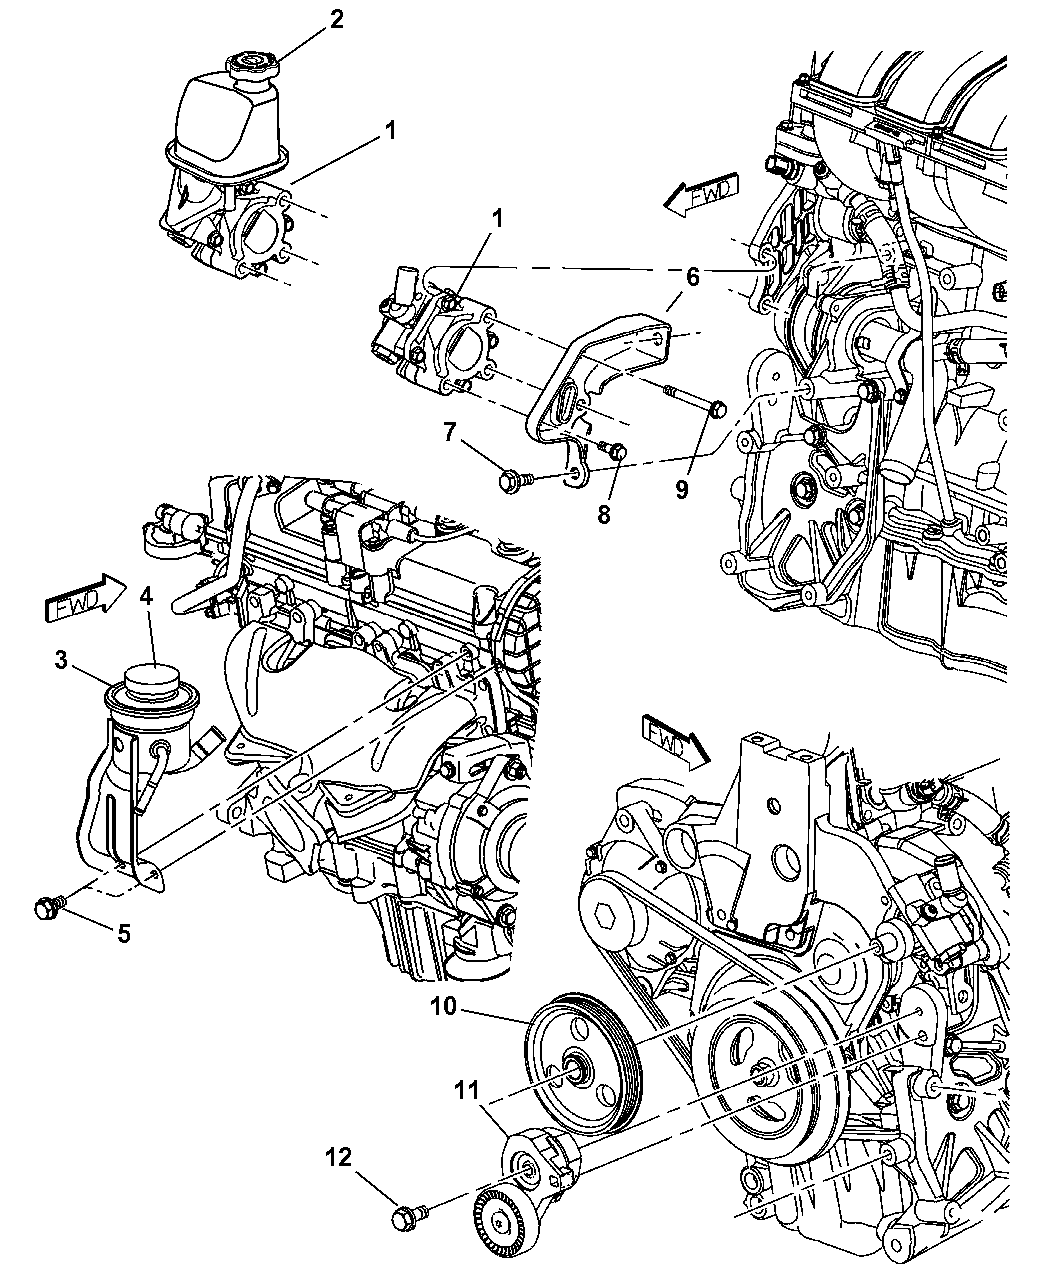 Pt Cruiser Engine Parts Diagram - Free Wiring Diagram | Pt Cruiser Engine Diagram |  | Free Wiring Diagram